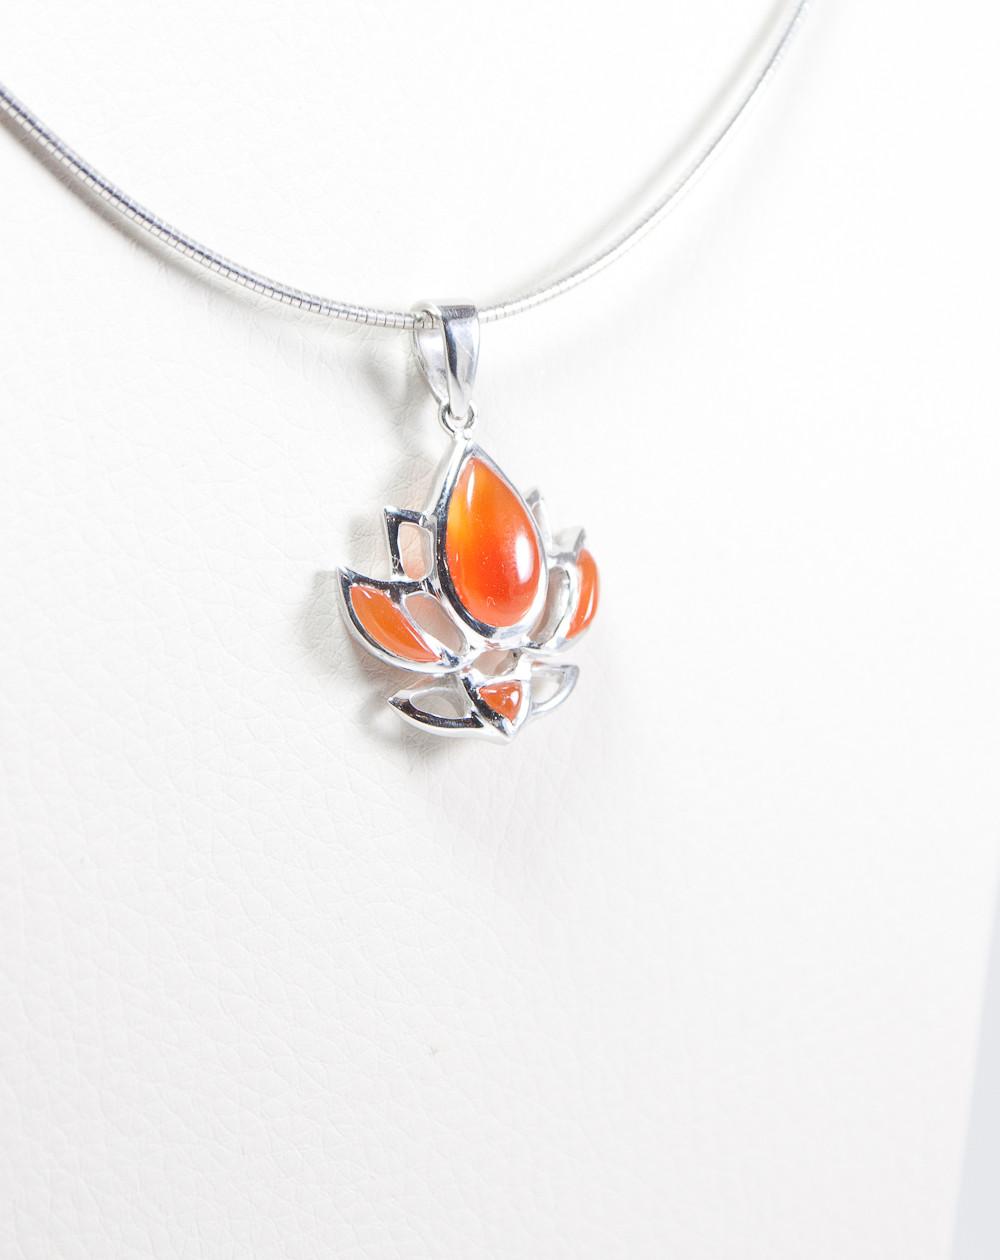 Pendentif fleur de lotus Dokbua, Cornaline, Sanuk Création, Bayonne